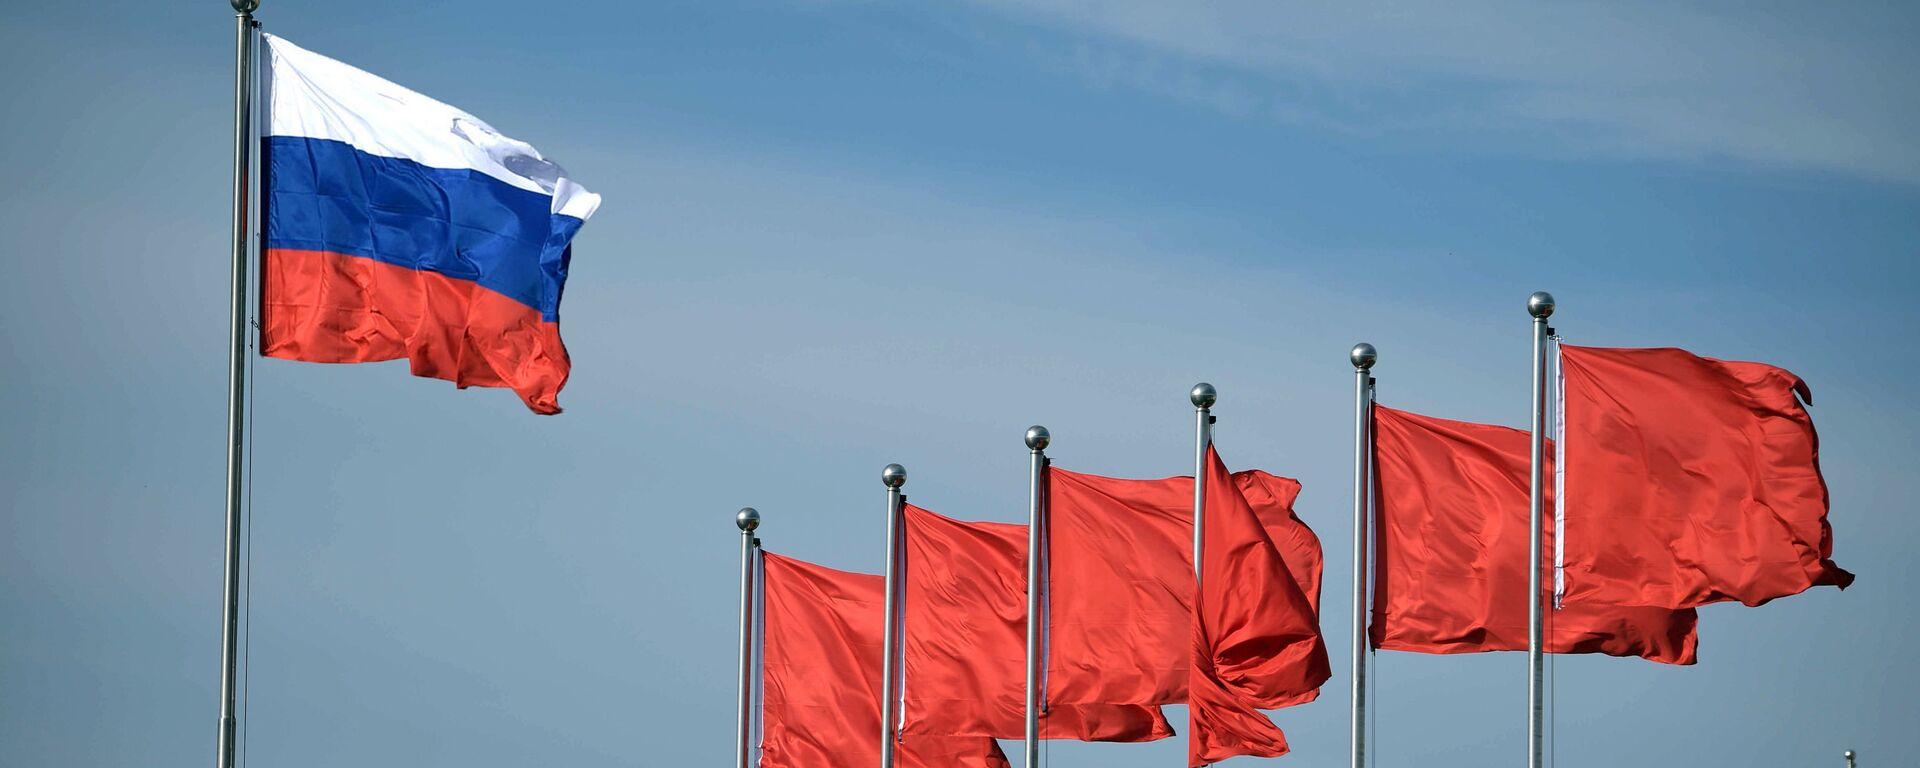 Флаг России и флаги КНР - Sputnik Latvija, 1920, 20.12.2020